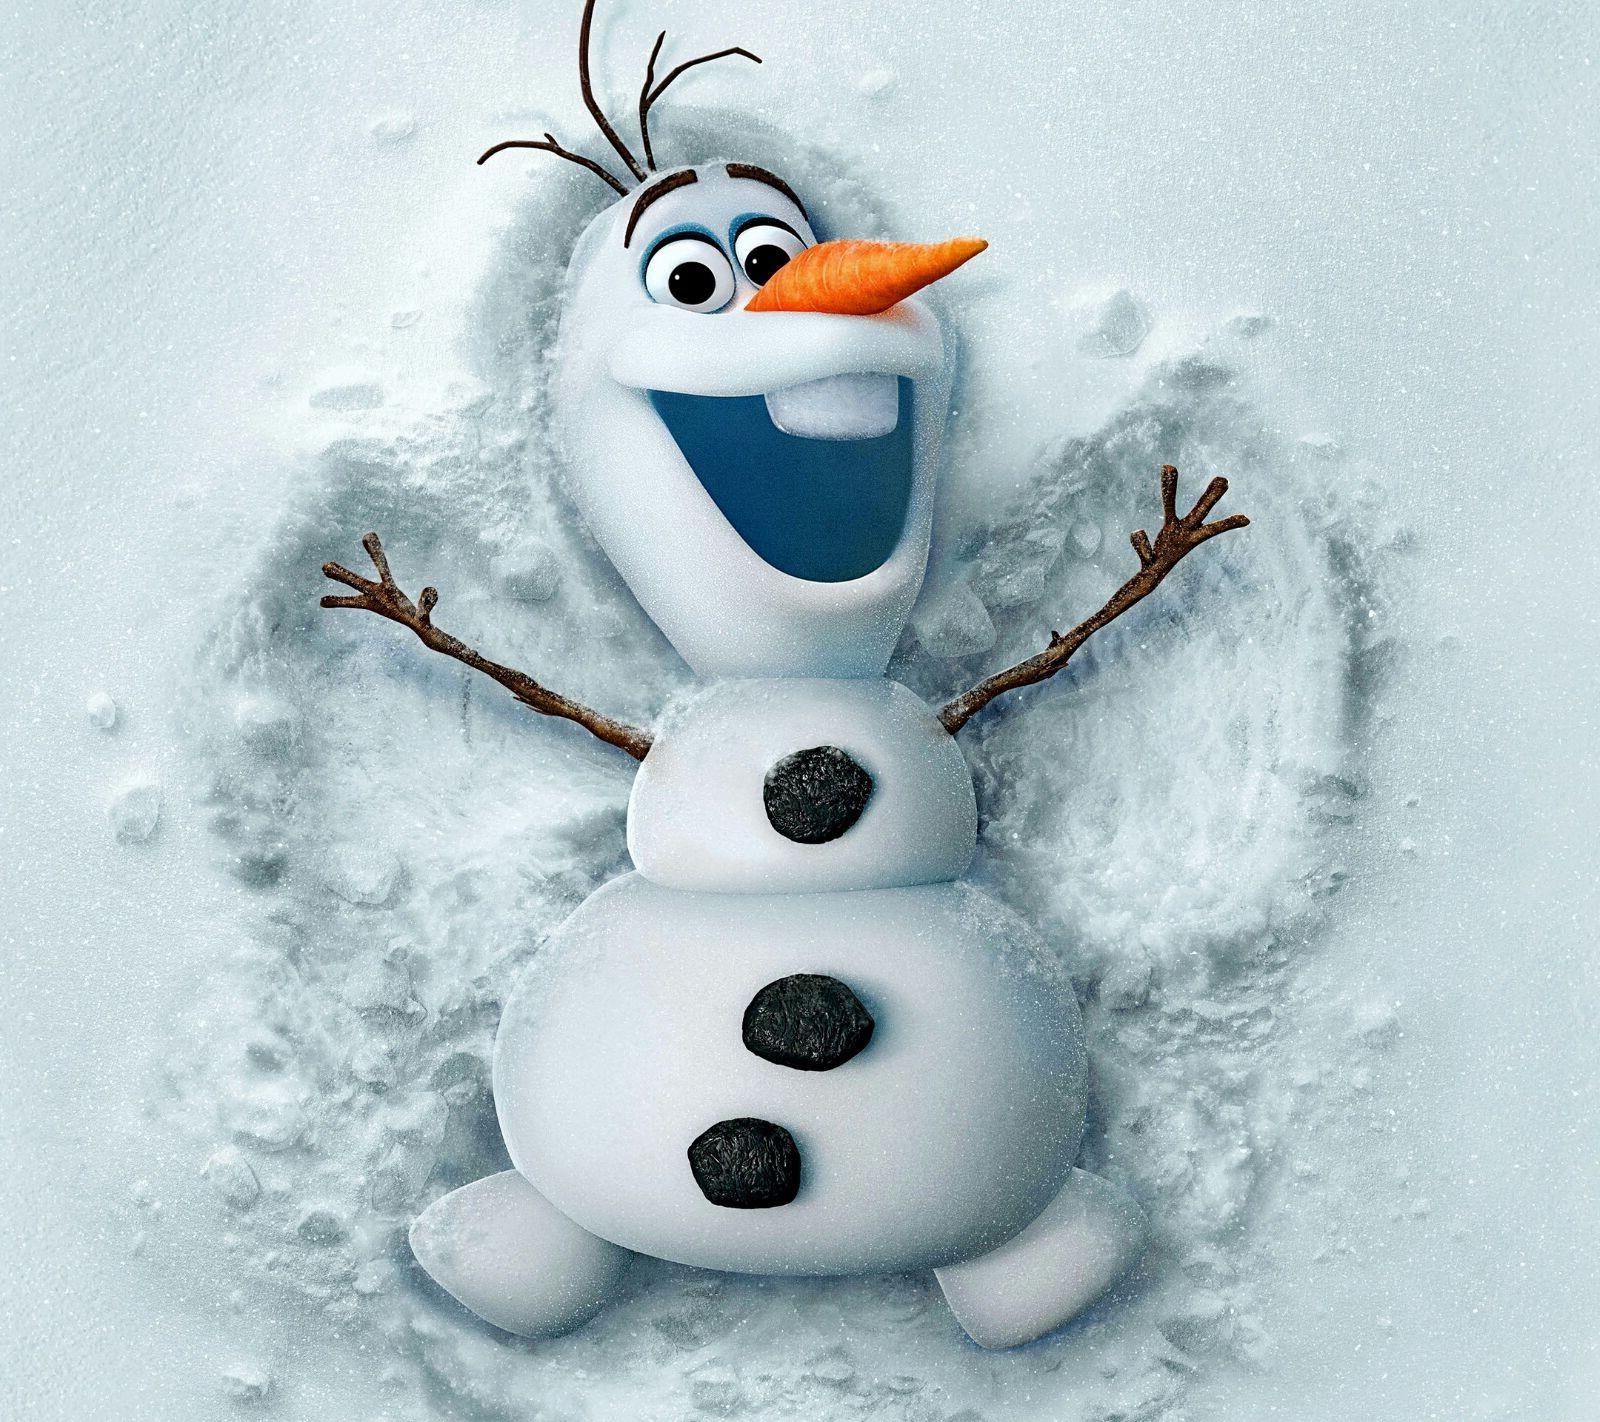 Olaf Snowman Frozen movie Wallpapers HD Desktop and 1600x1422